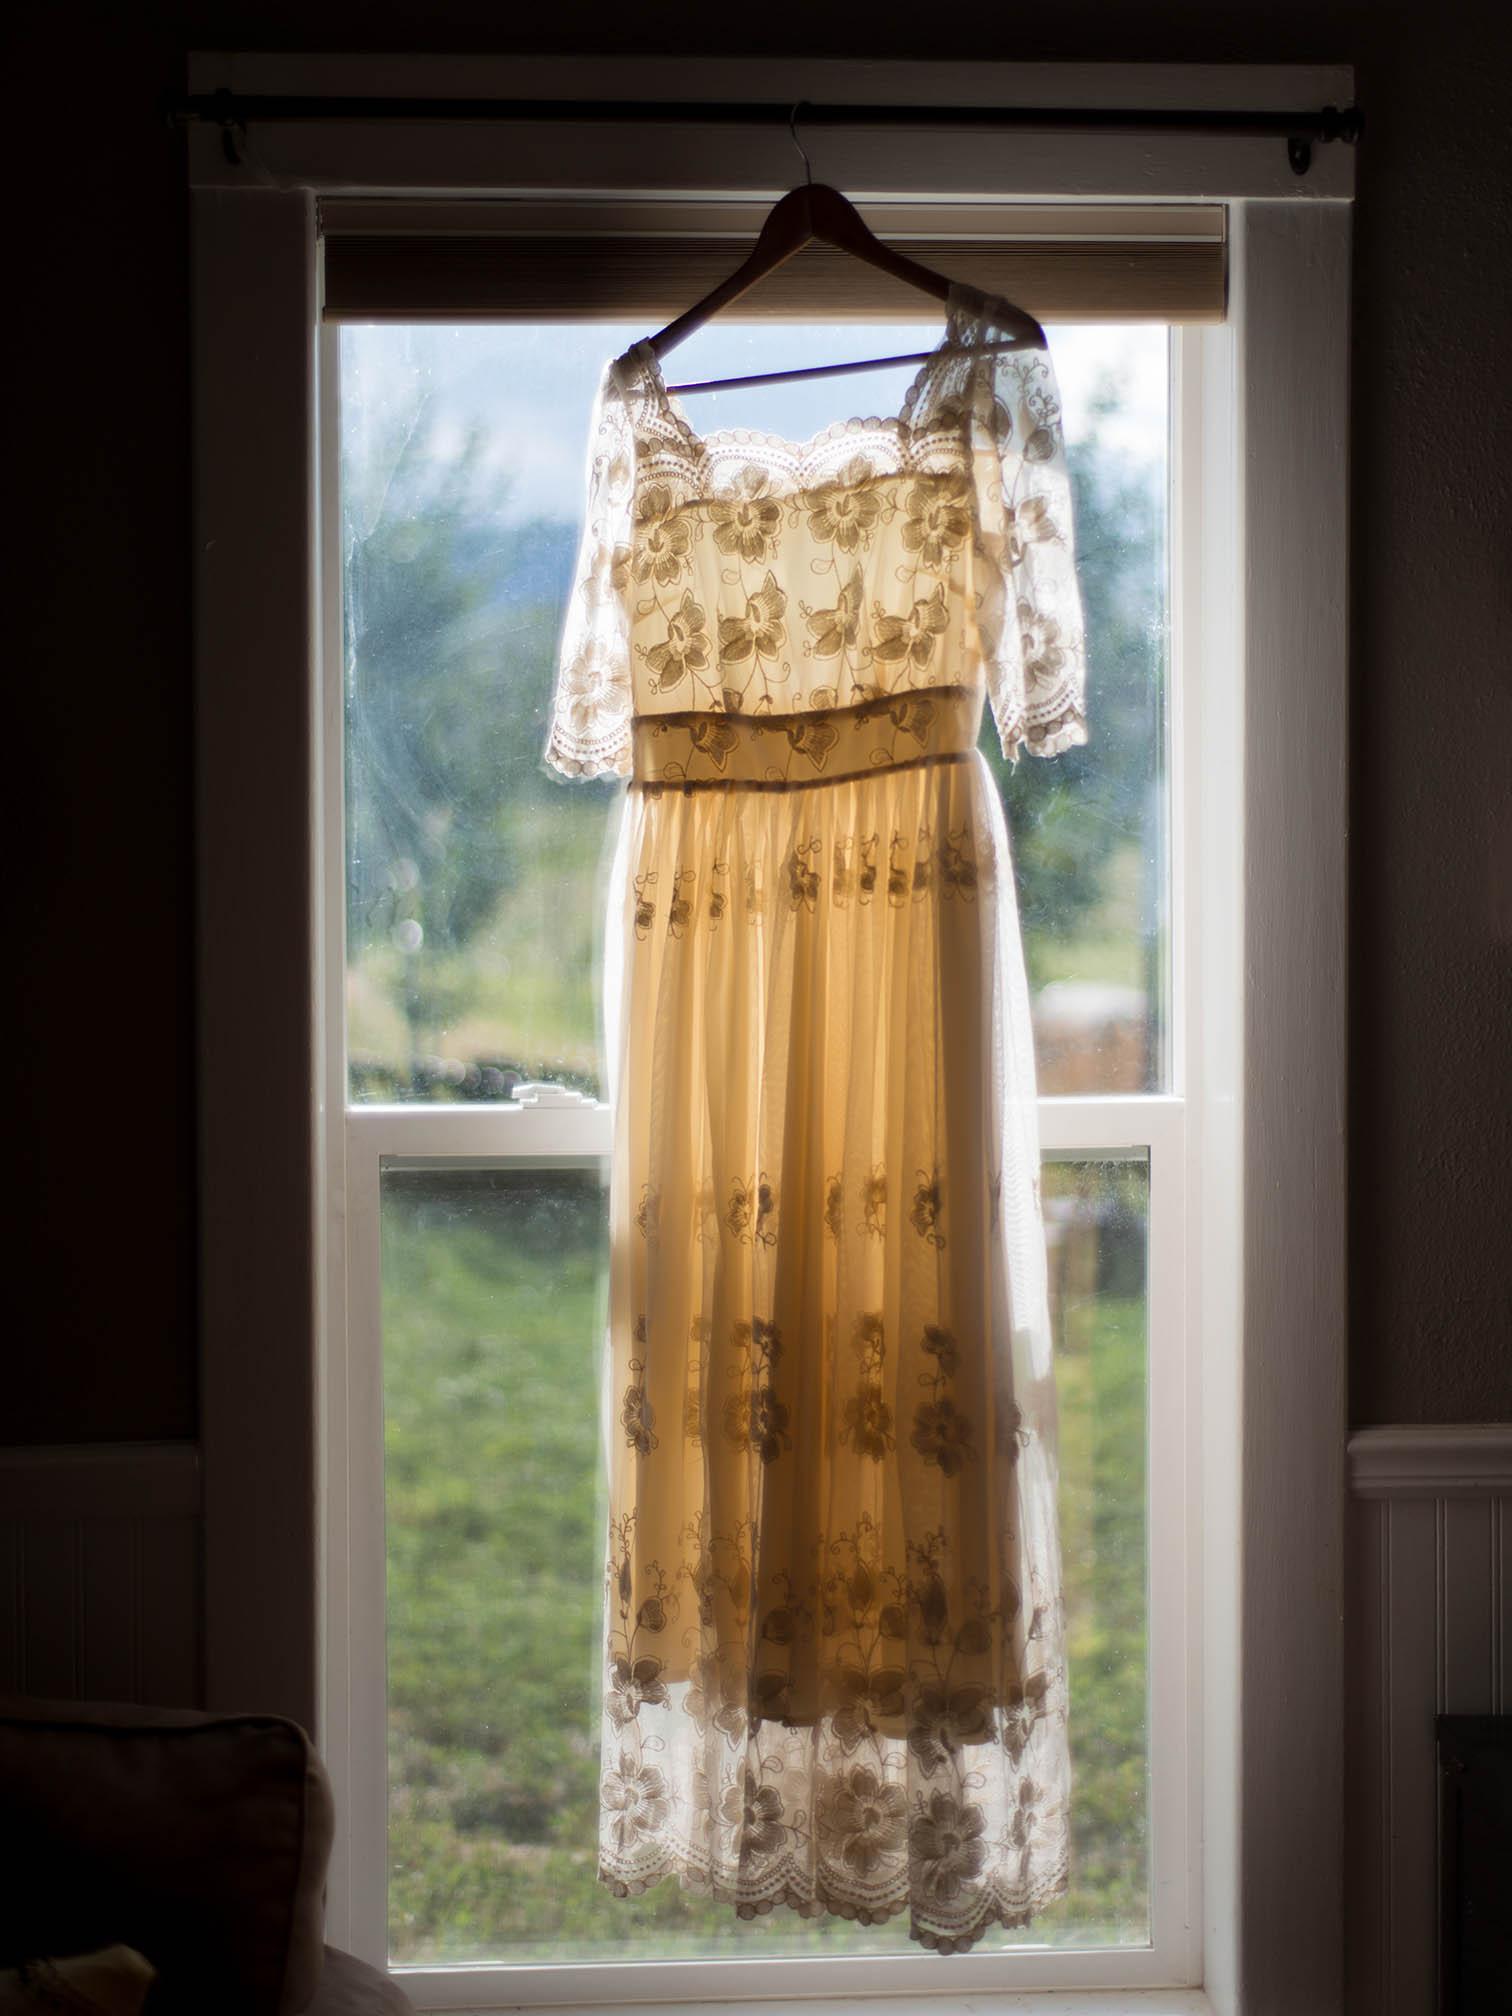 Aspen Colorado Elopement, wedding dress